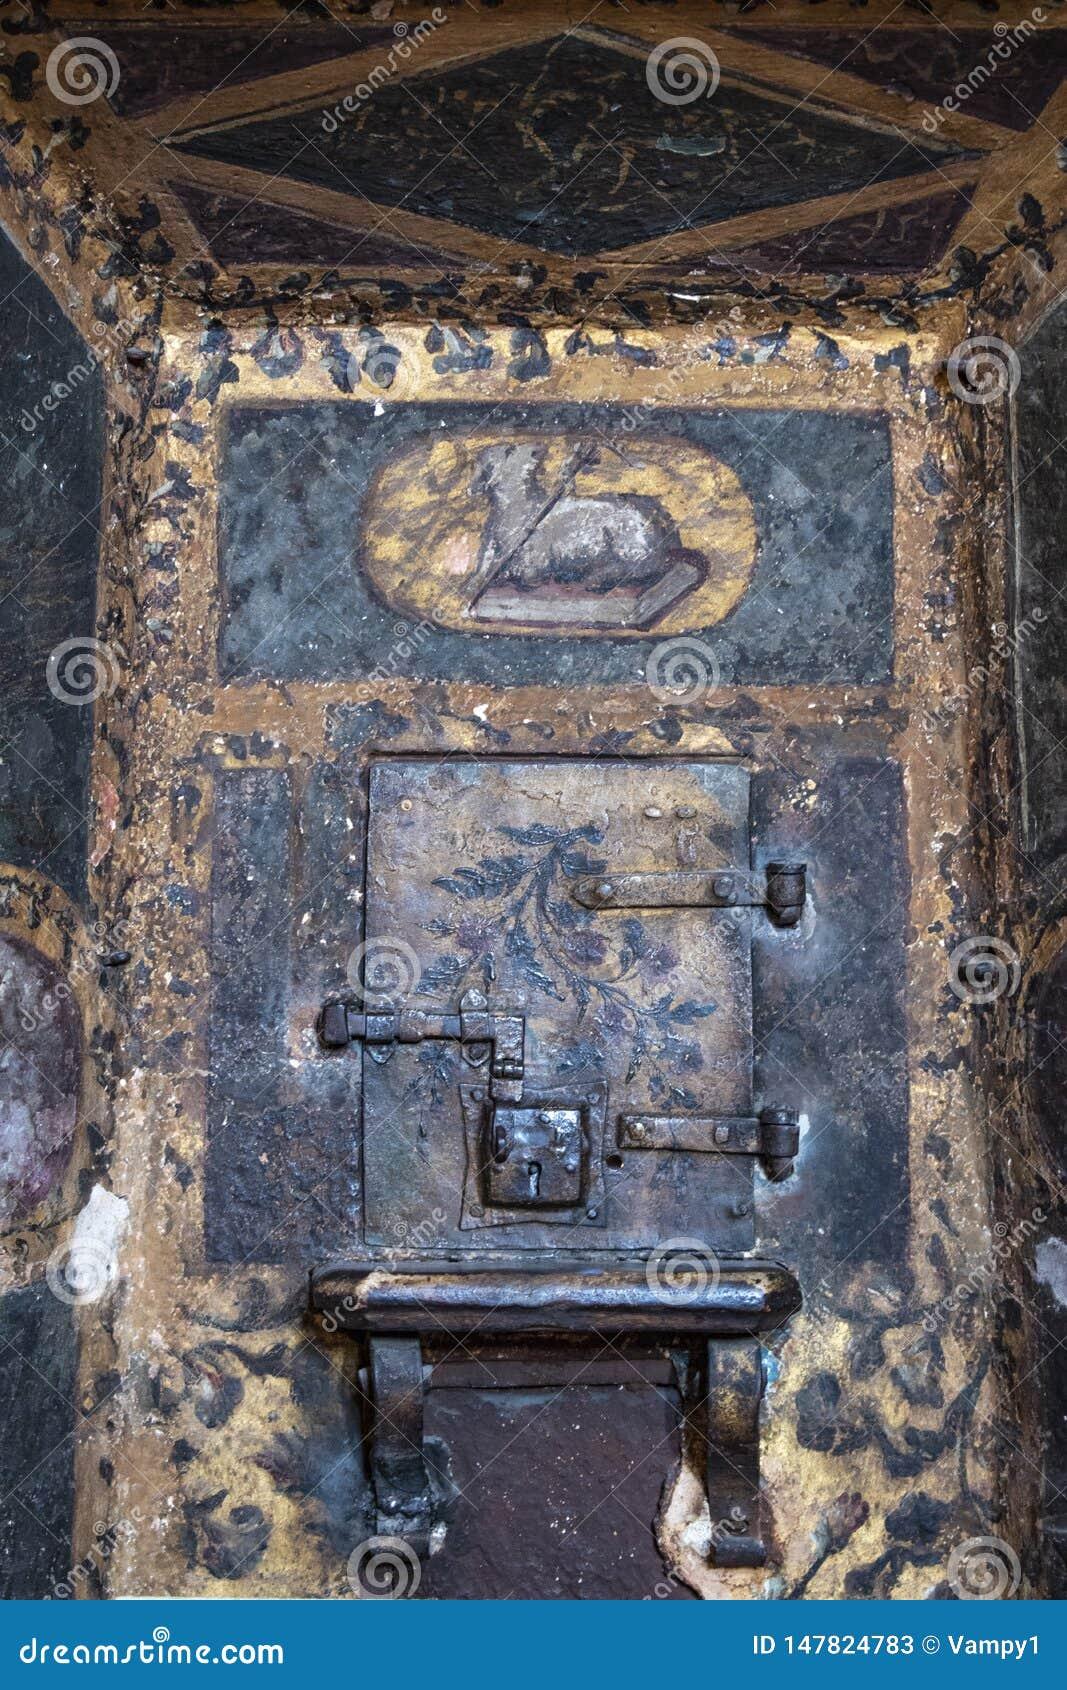 Milan, Italy, Europe, San Maurizio al Monastero Maggiore, church, the Sistine Chapel of Milan, art, fresco, monastery, convent